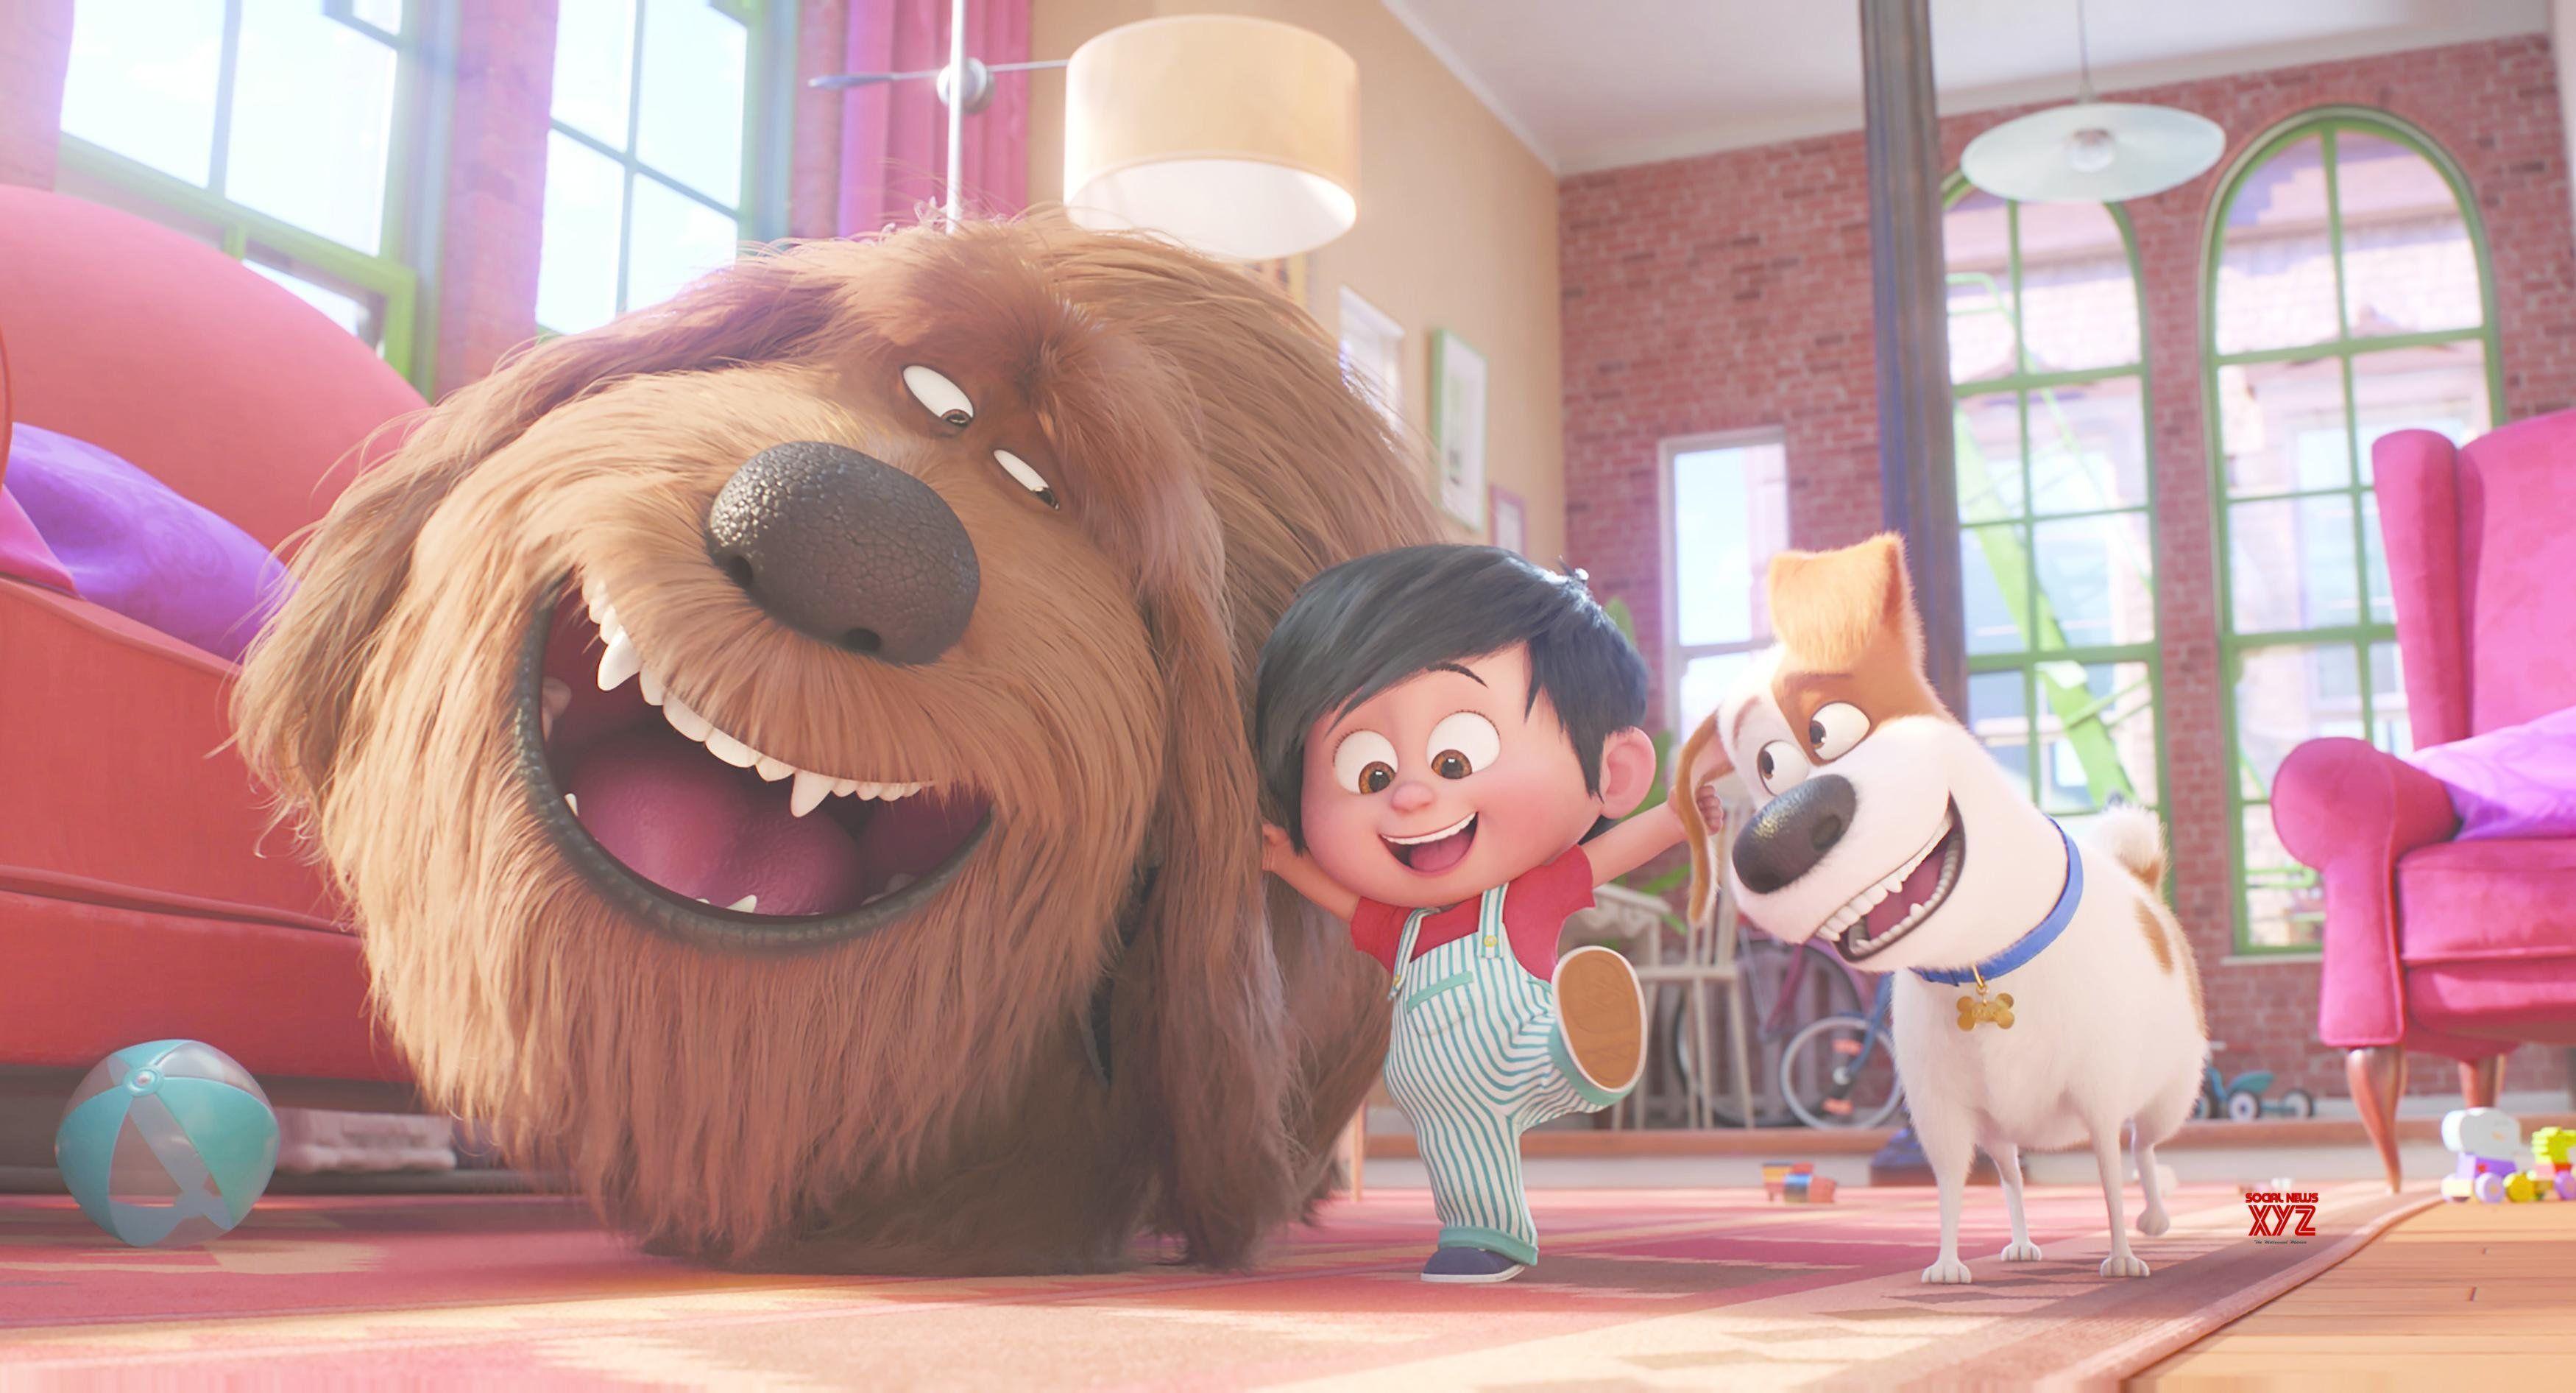 The Secret Life Of Pets 2 Review Pleasantly Amusing Despite Fluff